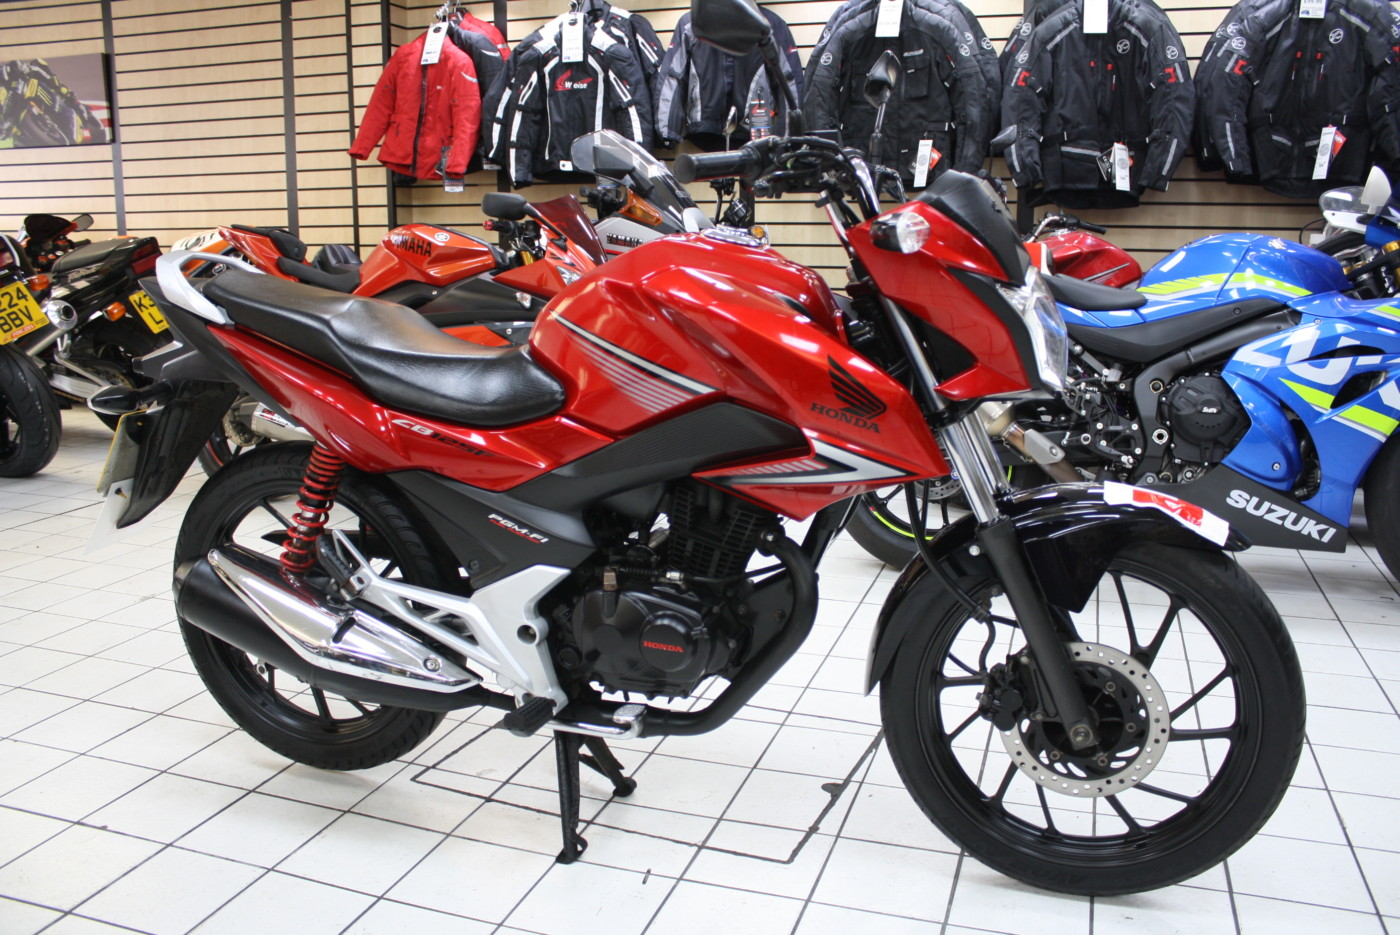 Honda GL125 CB125F 125cc